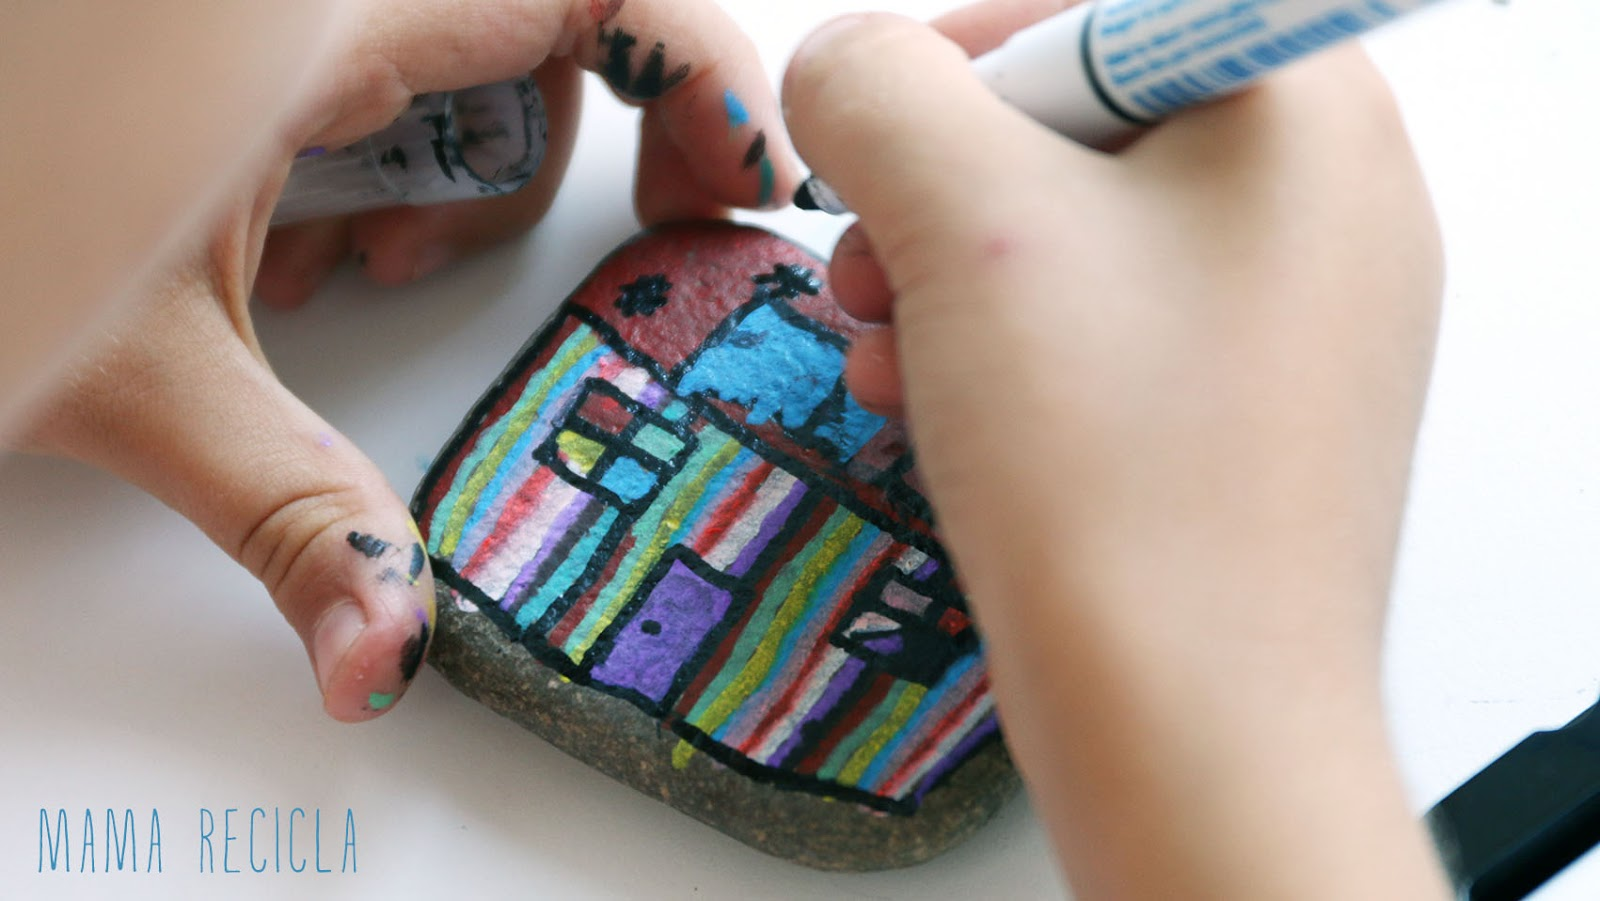 Pedras criativas